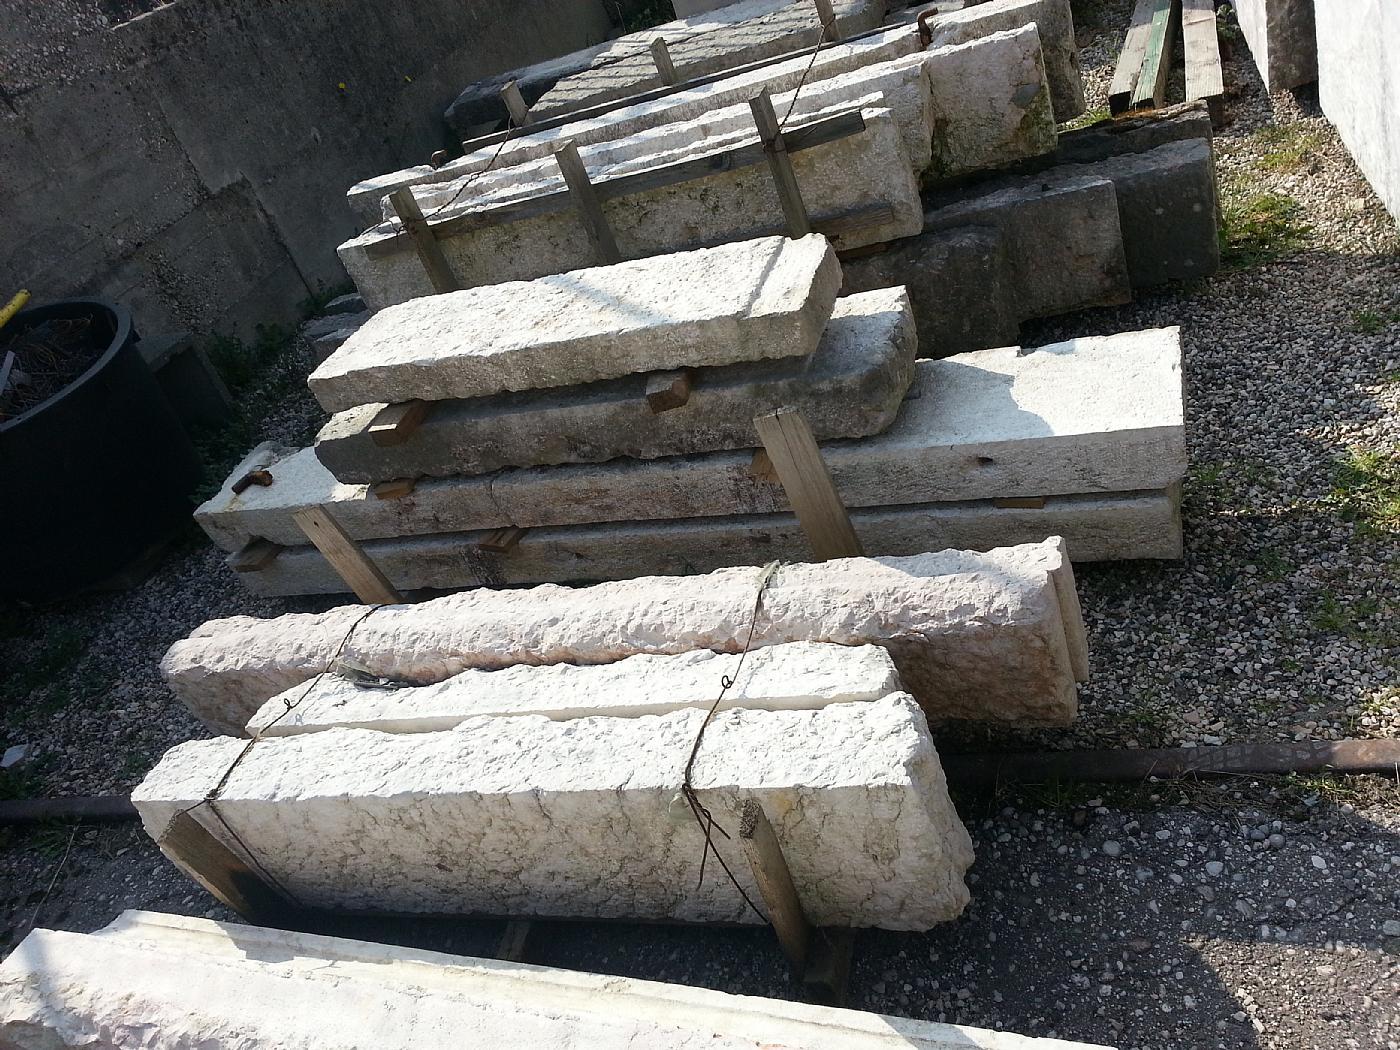 thumb4|potefinestre in pietra